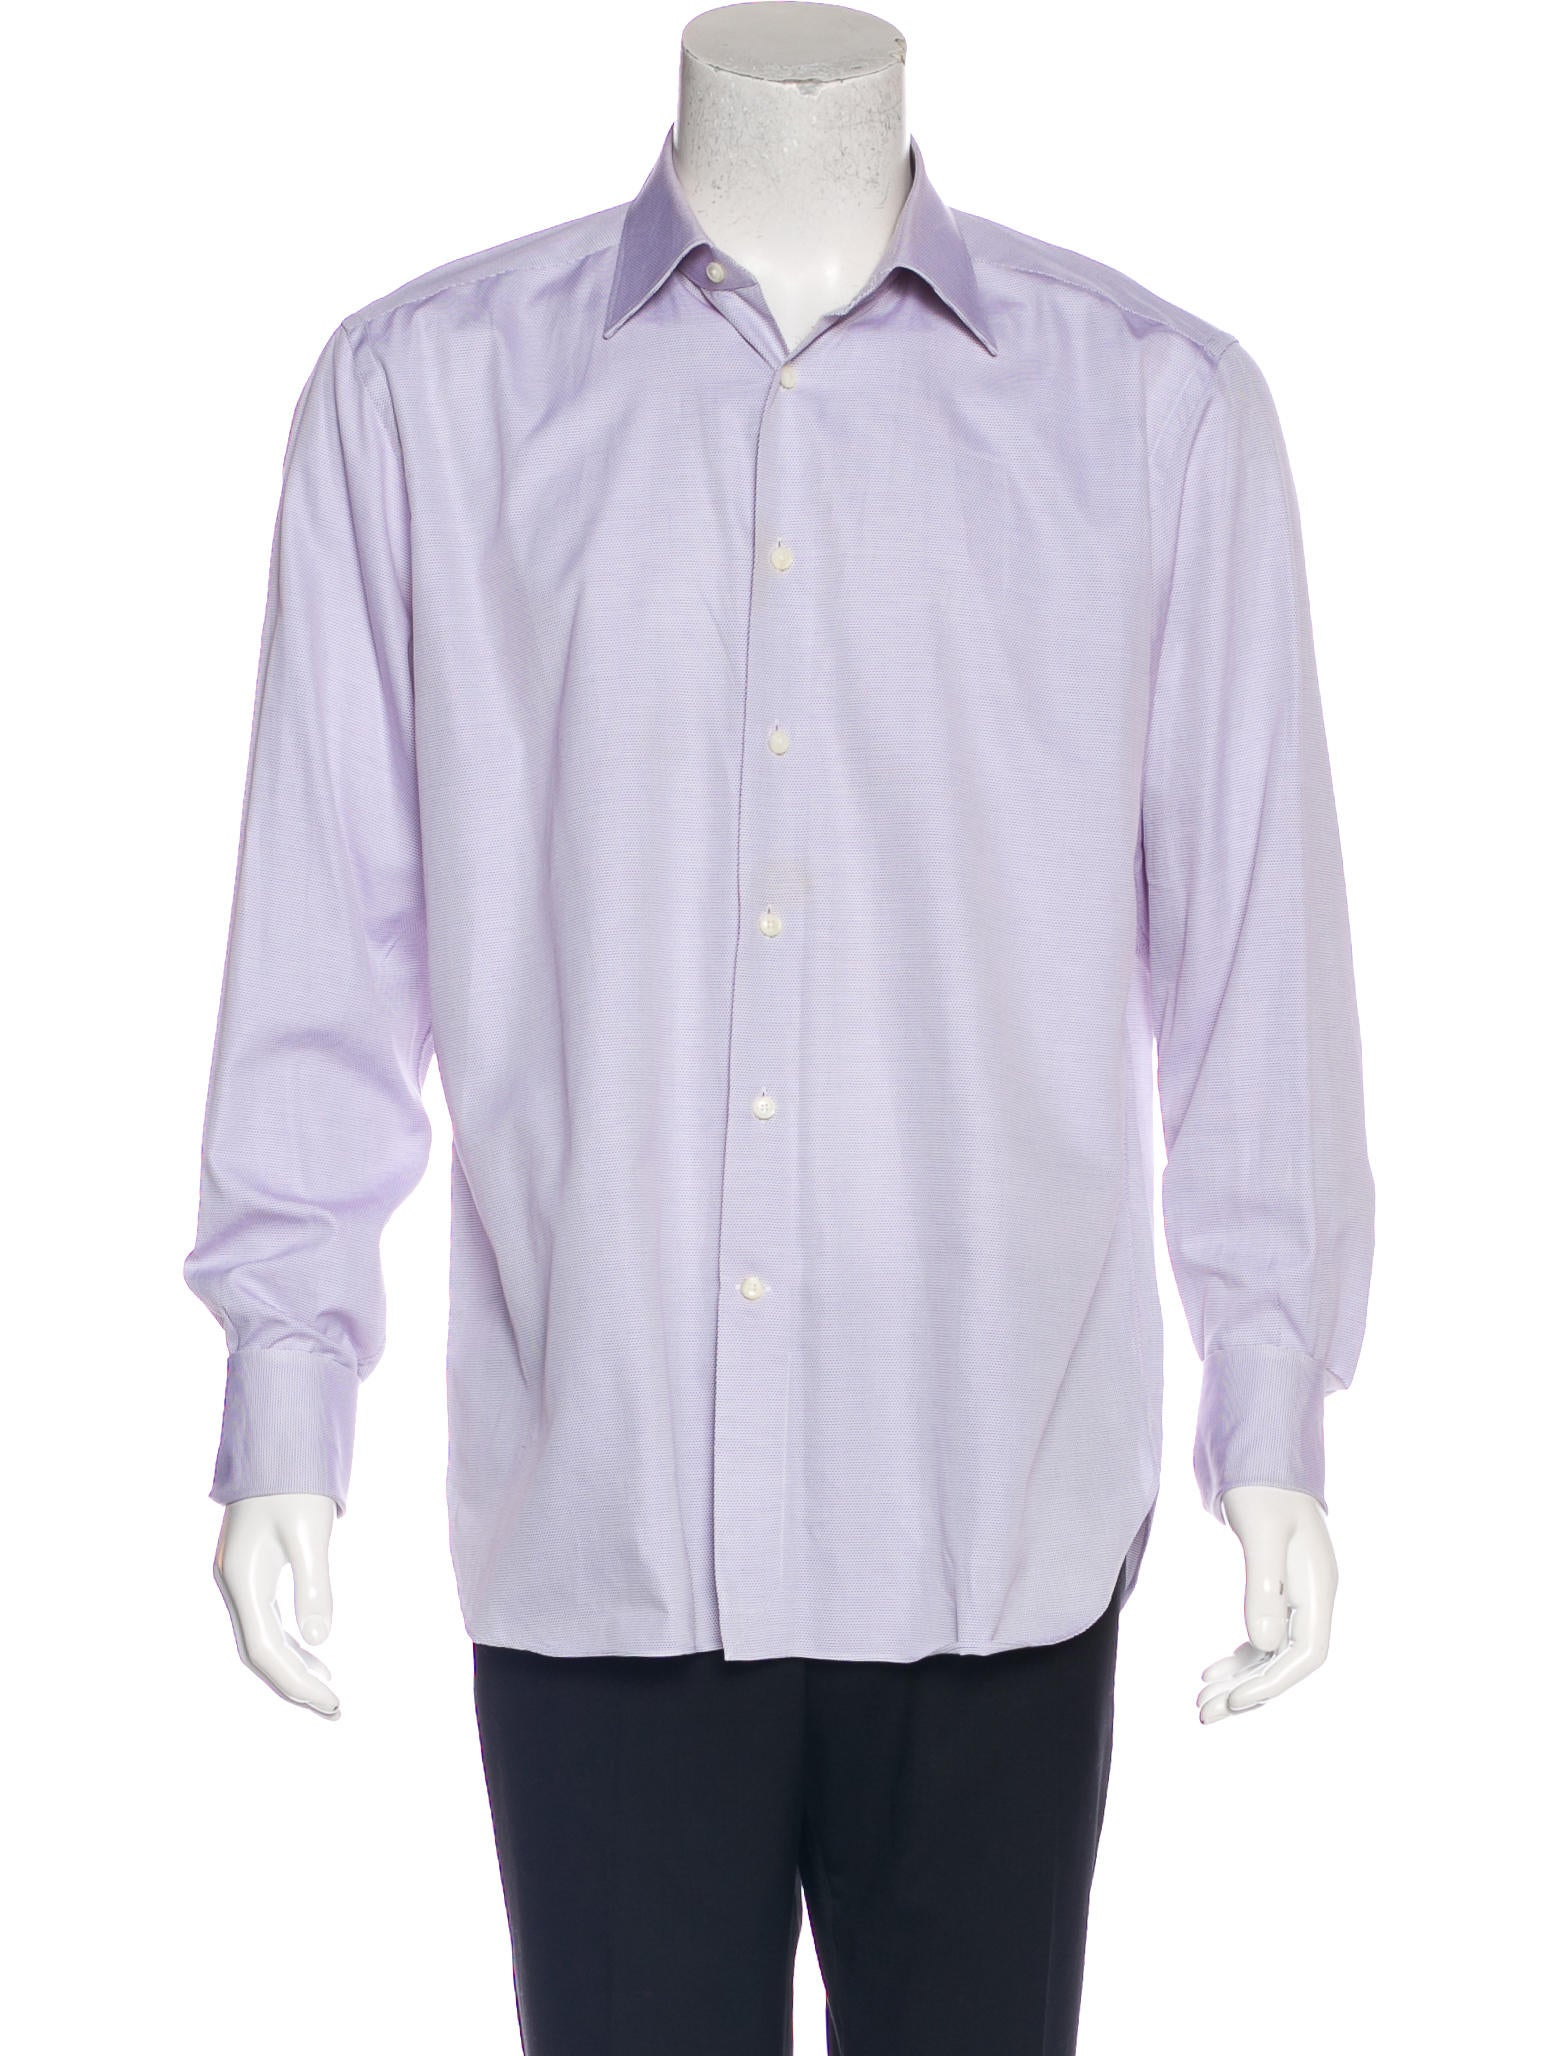 Ermenegildo zegna french cuff regular fit shirt clothing for French cuff dress shirts for sale